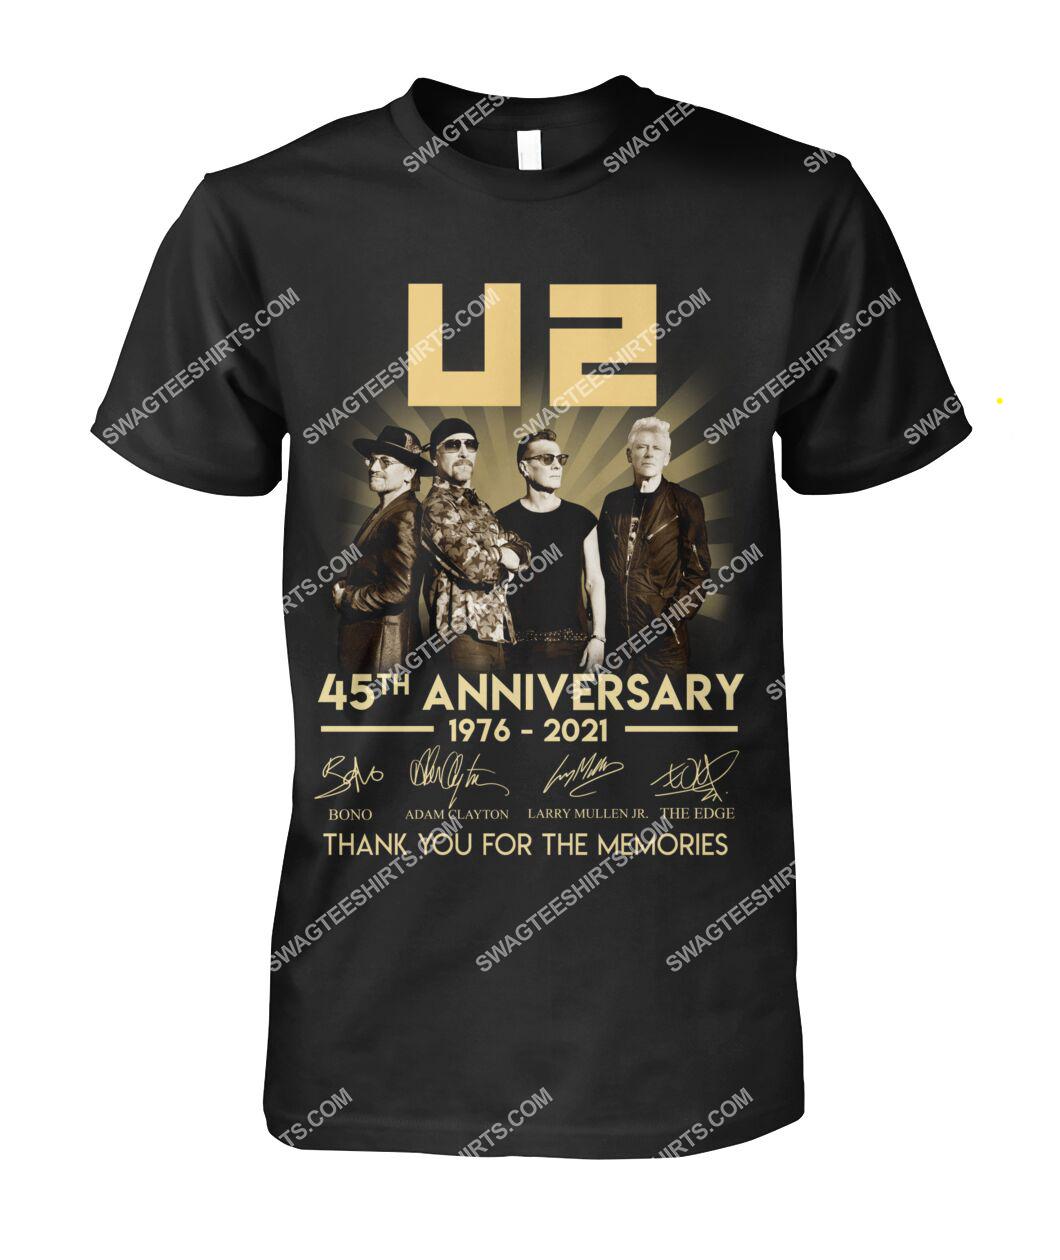 u2 music band 45th anniversary thank you for memories signatures tshirt 1